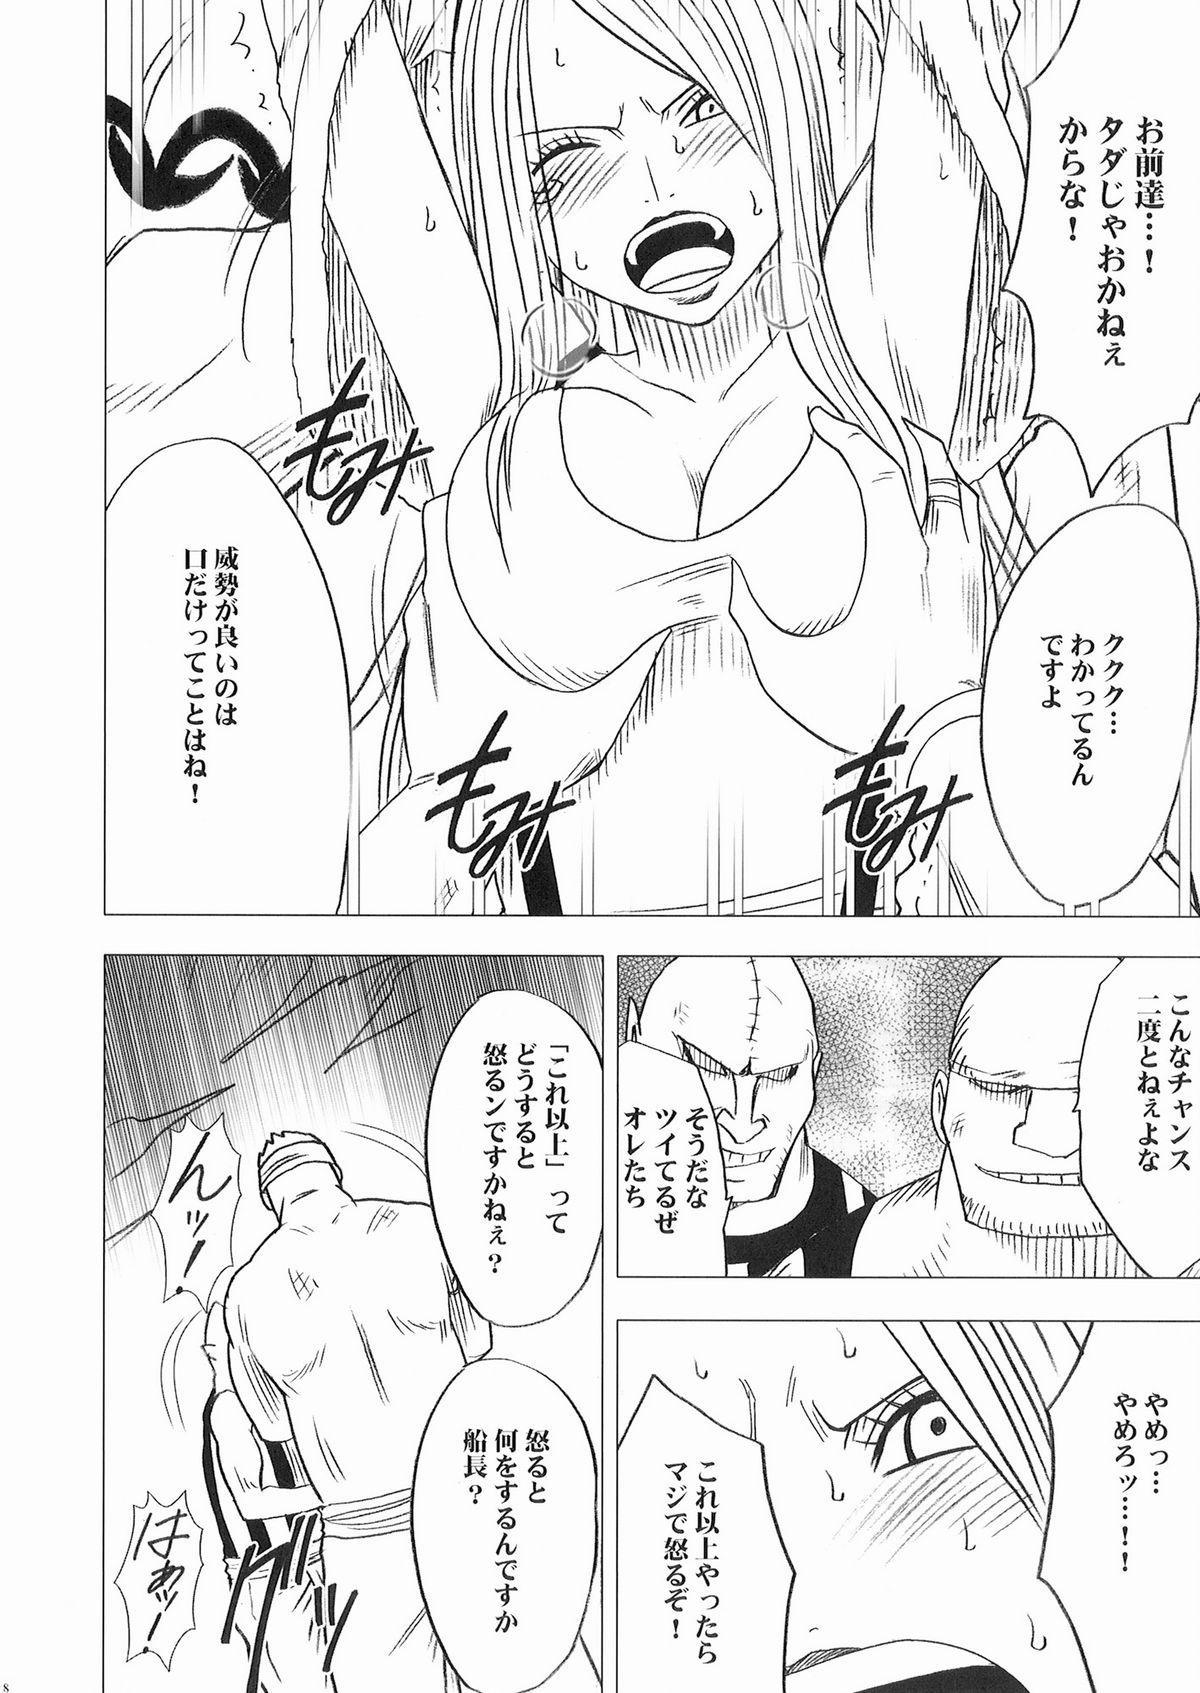 Bonnie no Haiboku 8